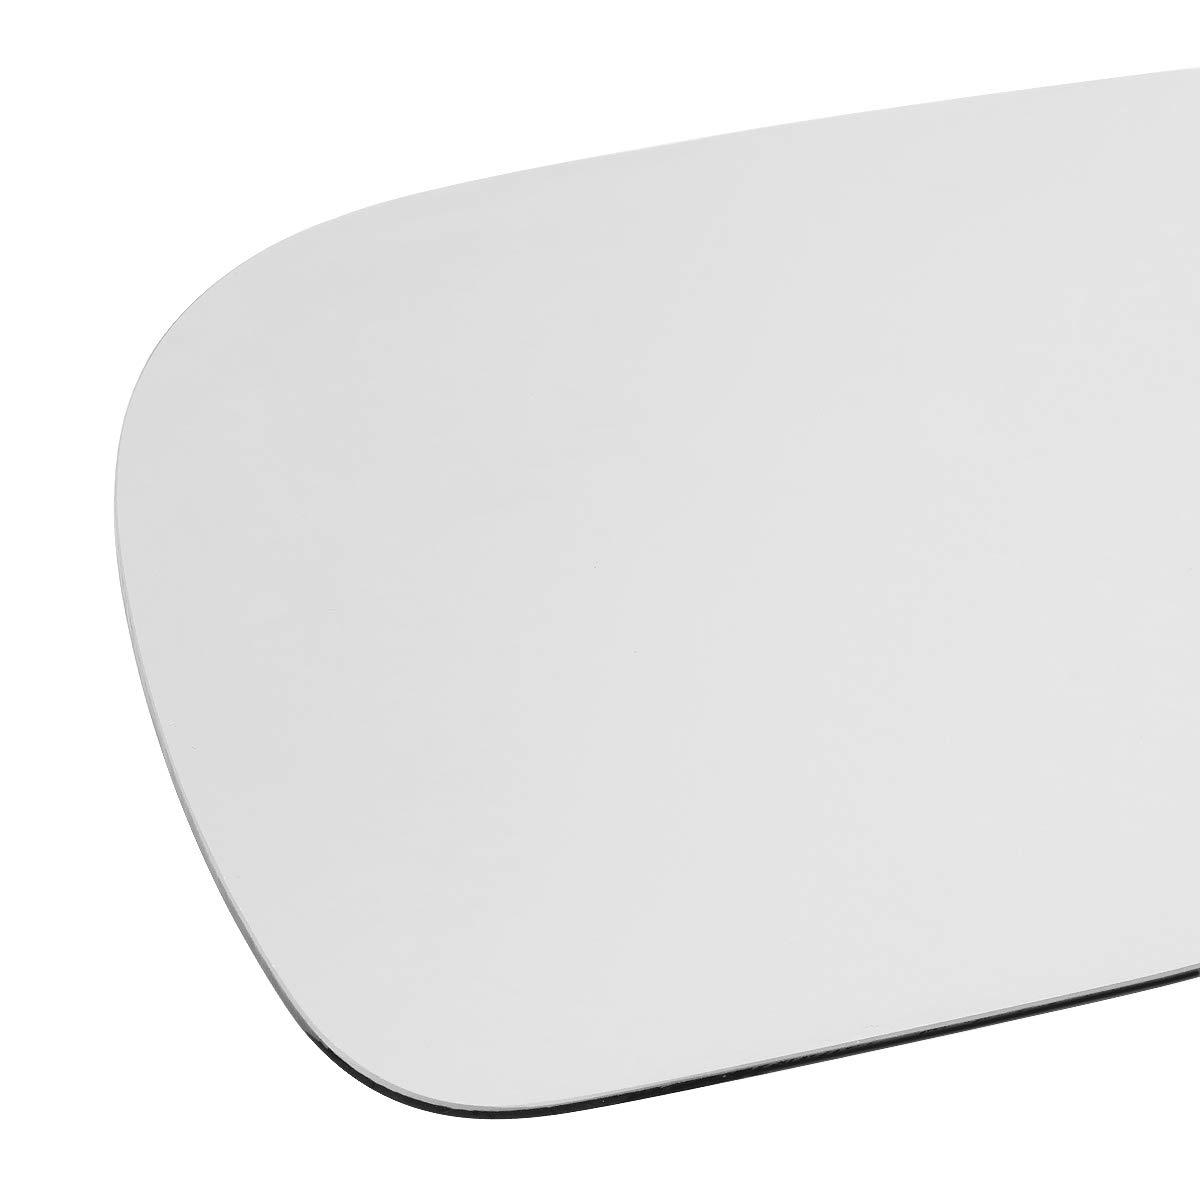 DNA Motoring SMP-020-L Left//Driver Side Door Rear View Mirror Glass Lens